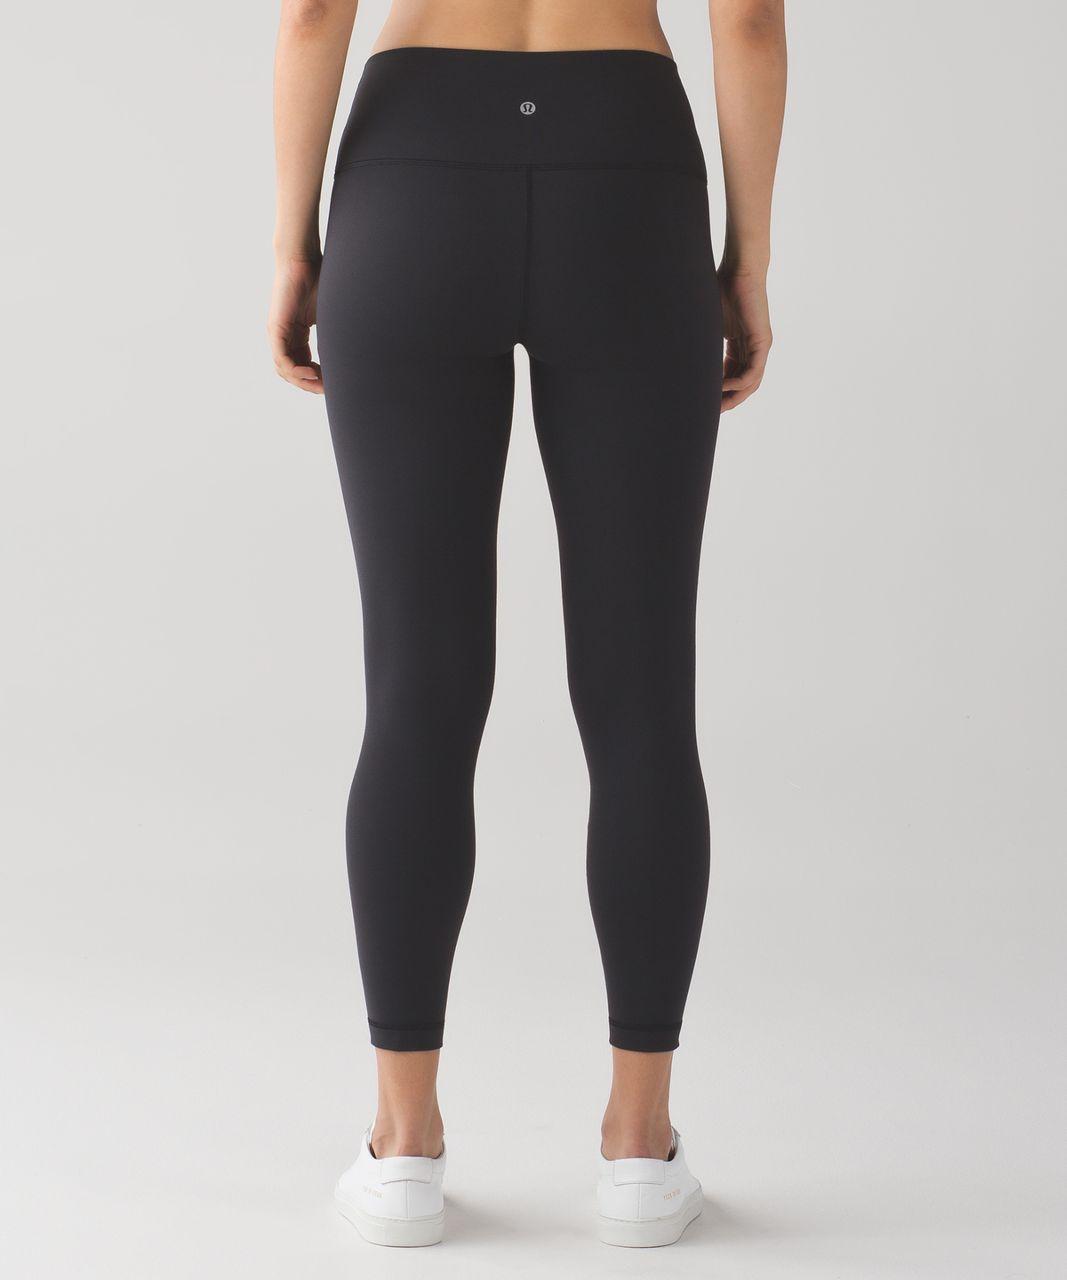 Lululemon High Times Pant (Brushed) - Black